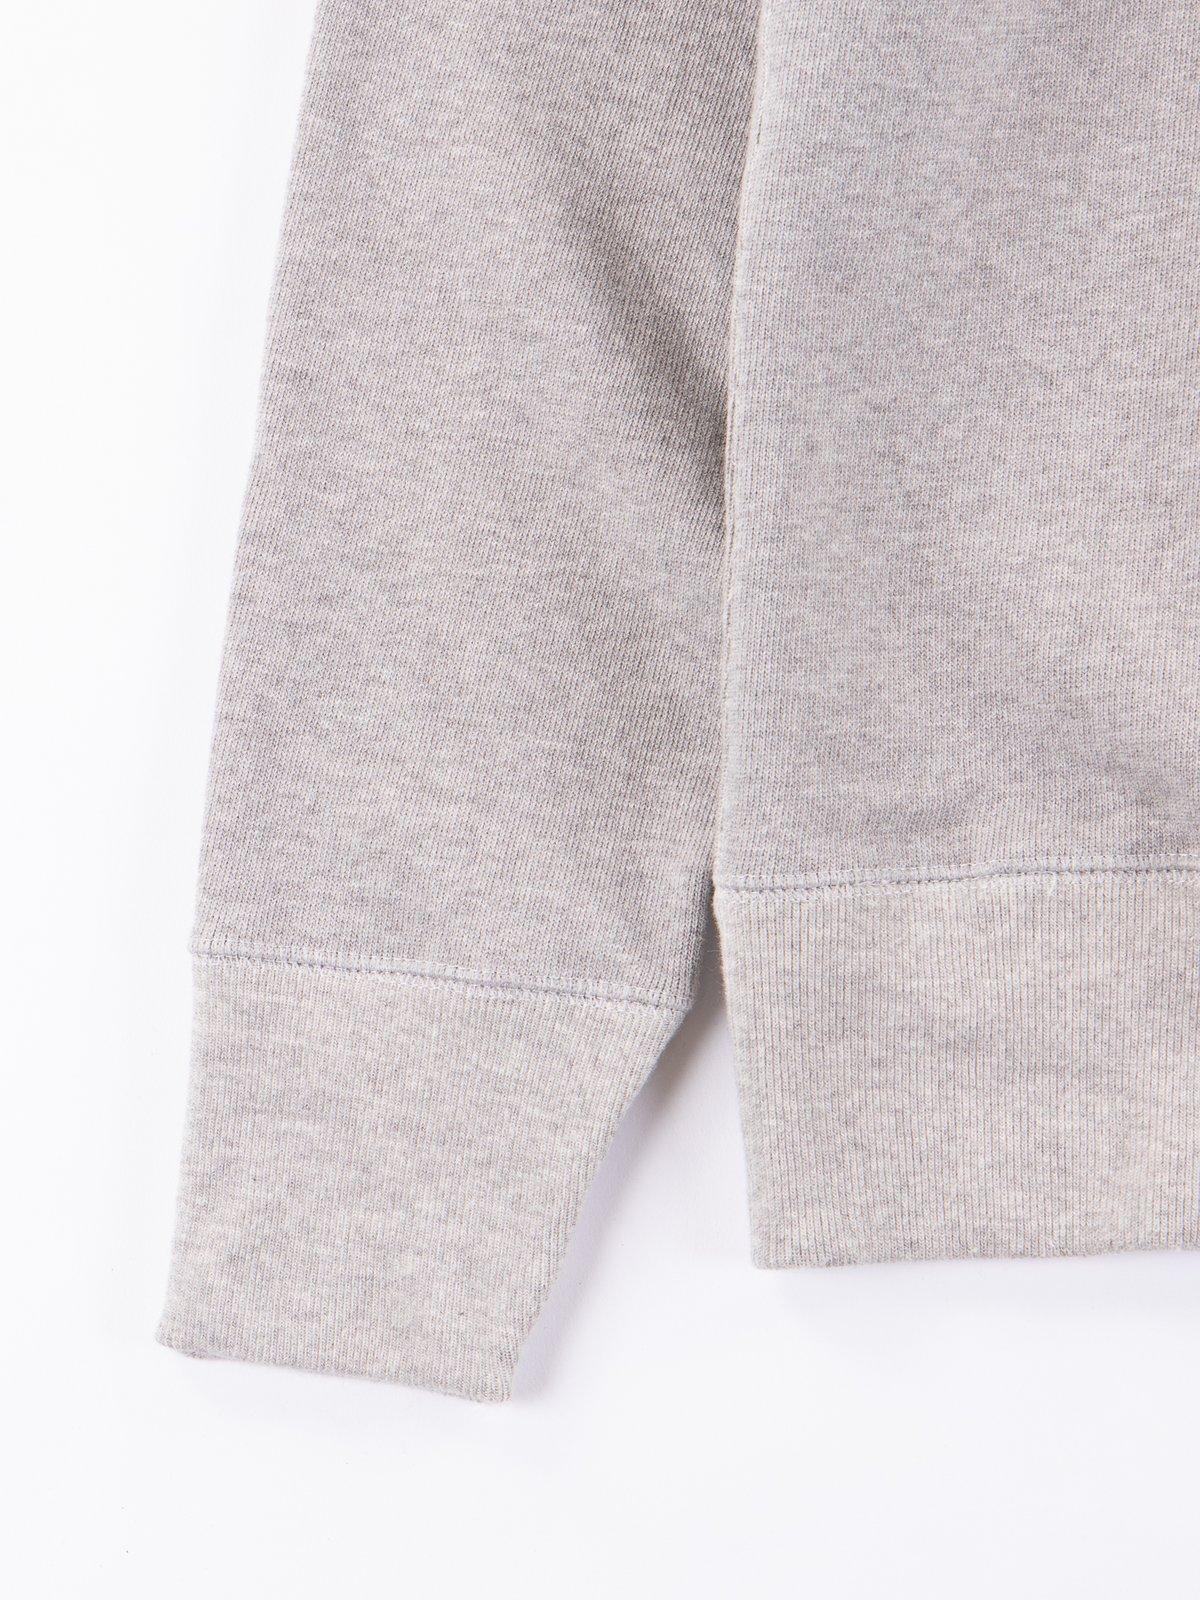 Grey Melange 3S48 Organic Cotton Heavy Sweater - Image 3